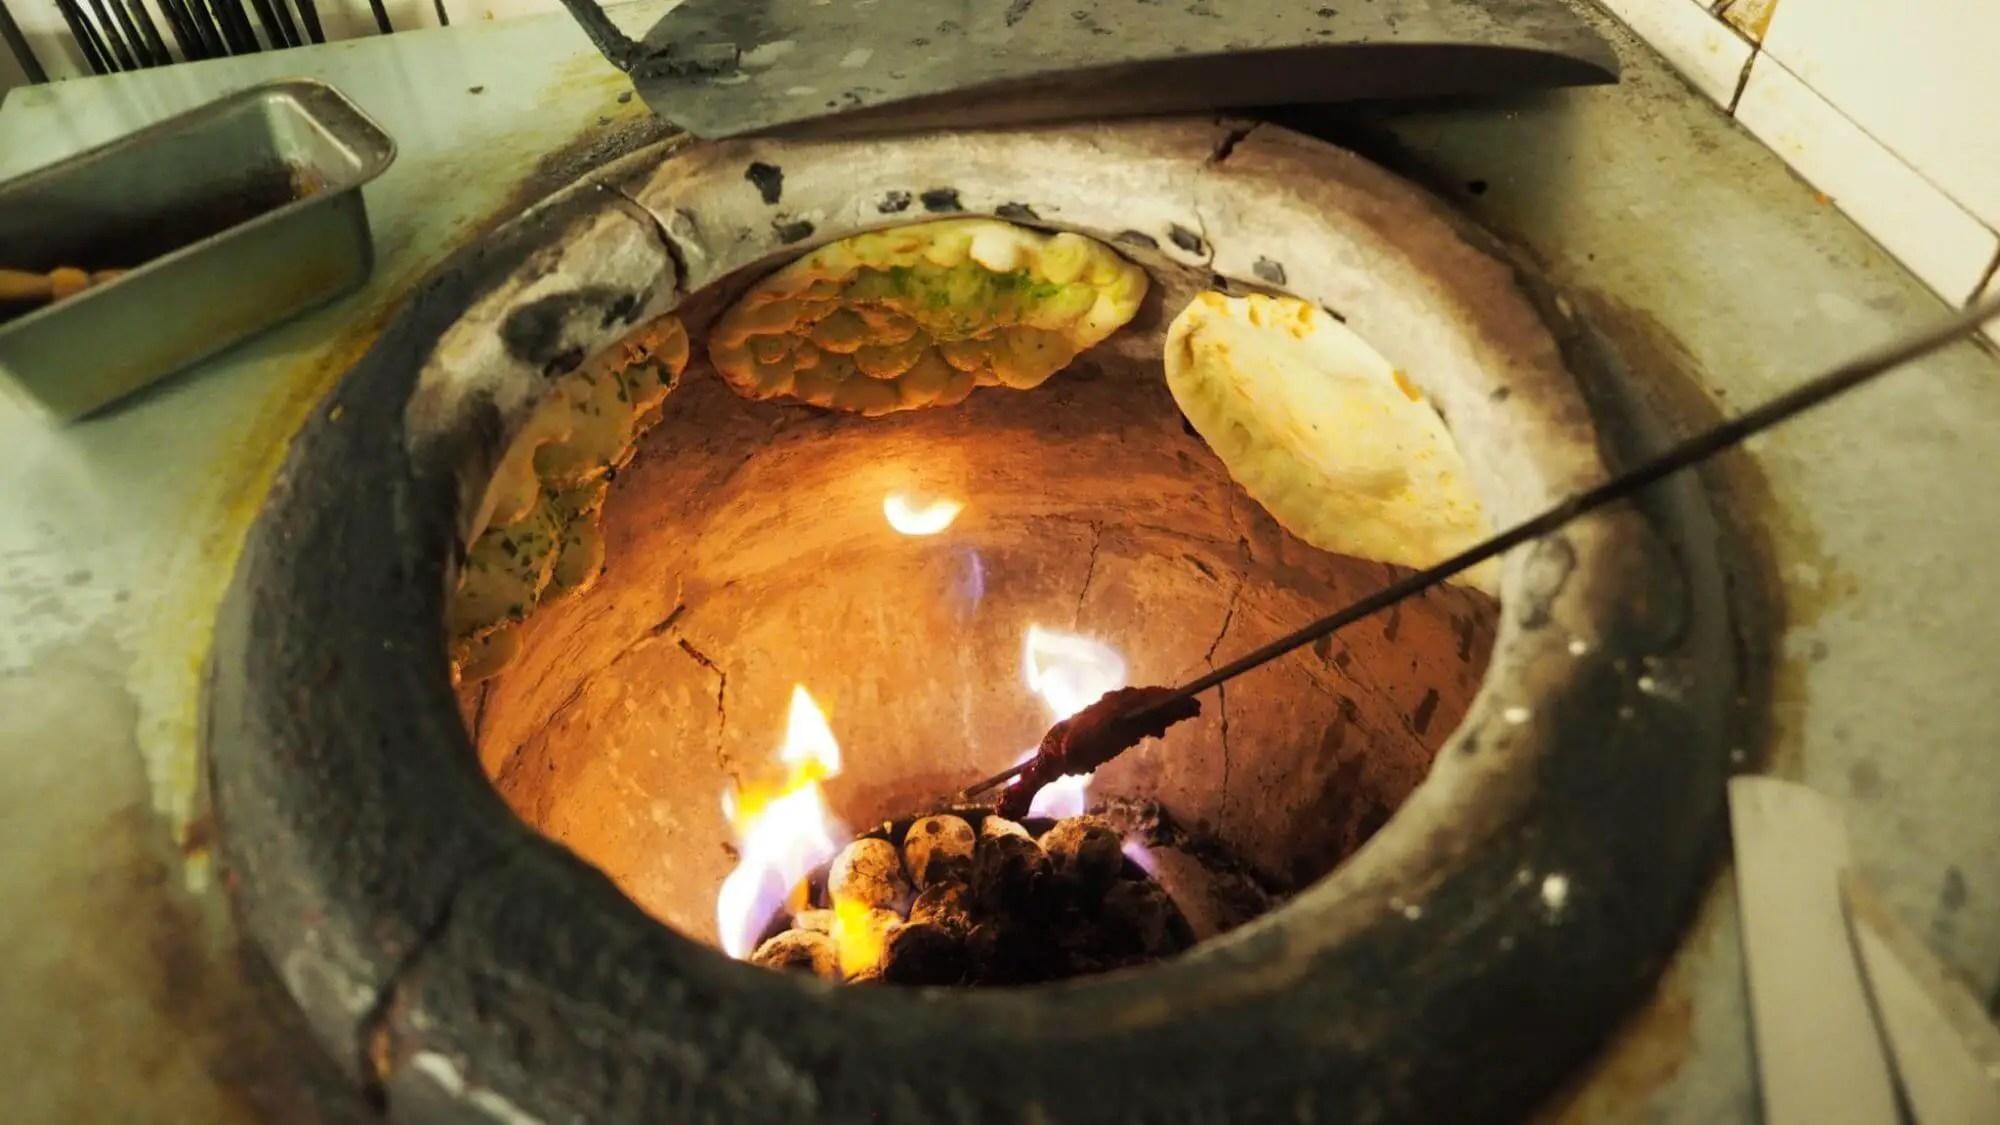 tandoori kyllingeburger opskrift - klassisk tandoor lerovn